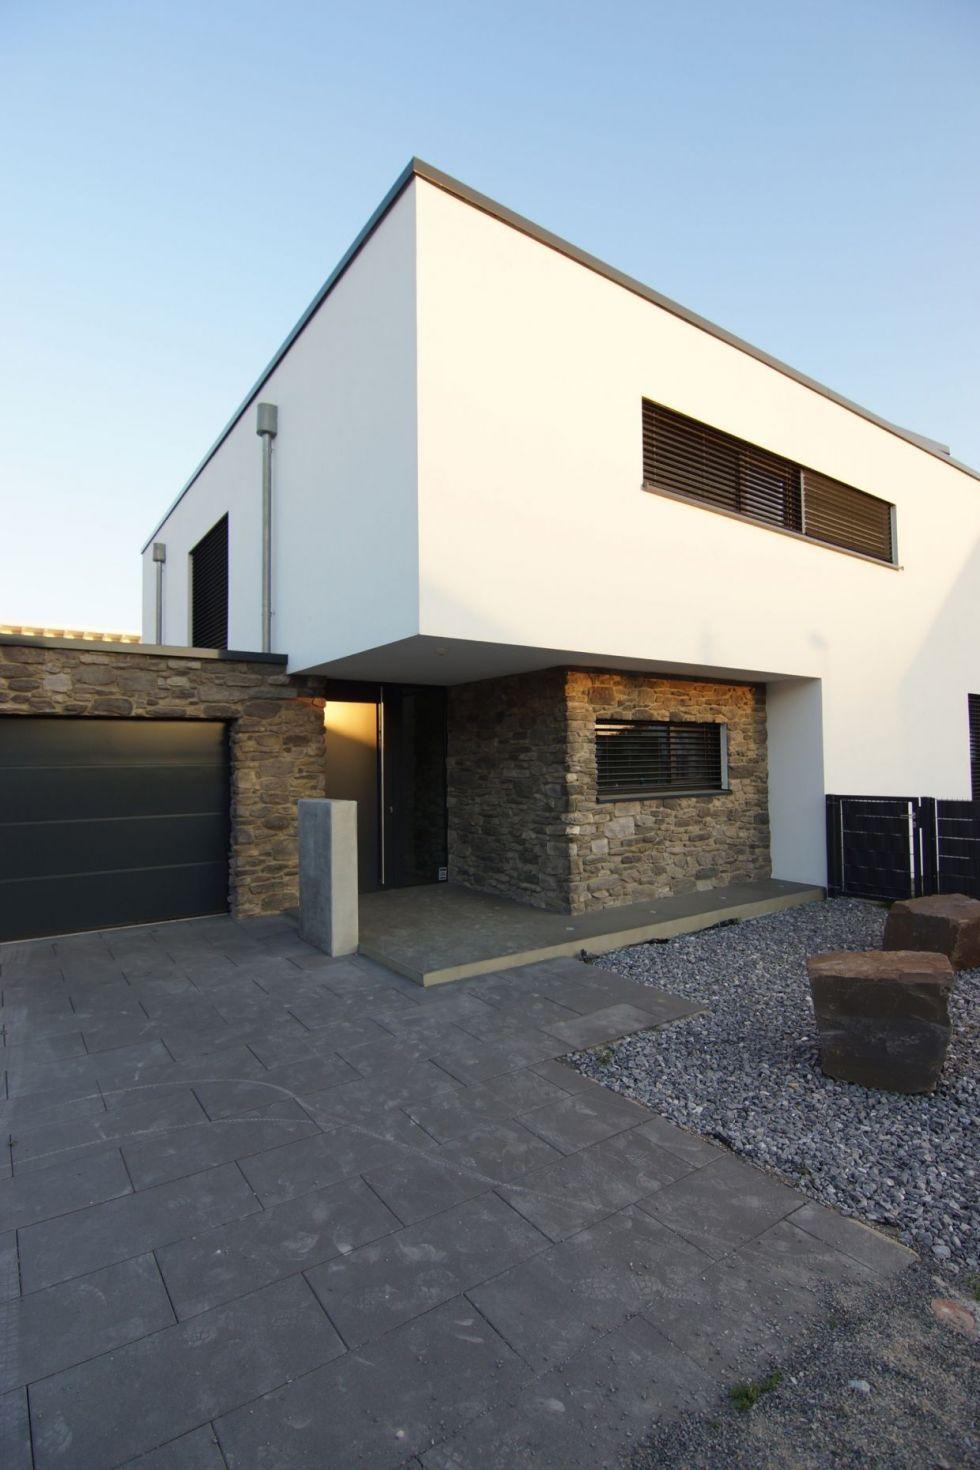 Hauspläne modern  Haus_pi - aprikari GmbH & Co. KG | Hauspläne | Pinterest | Haus ...